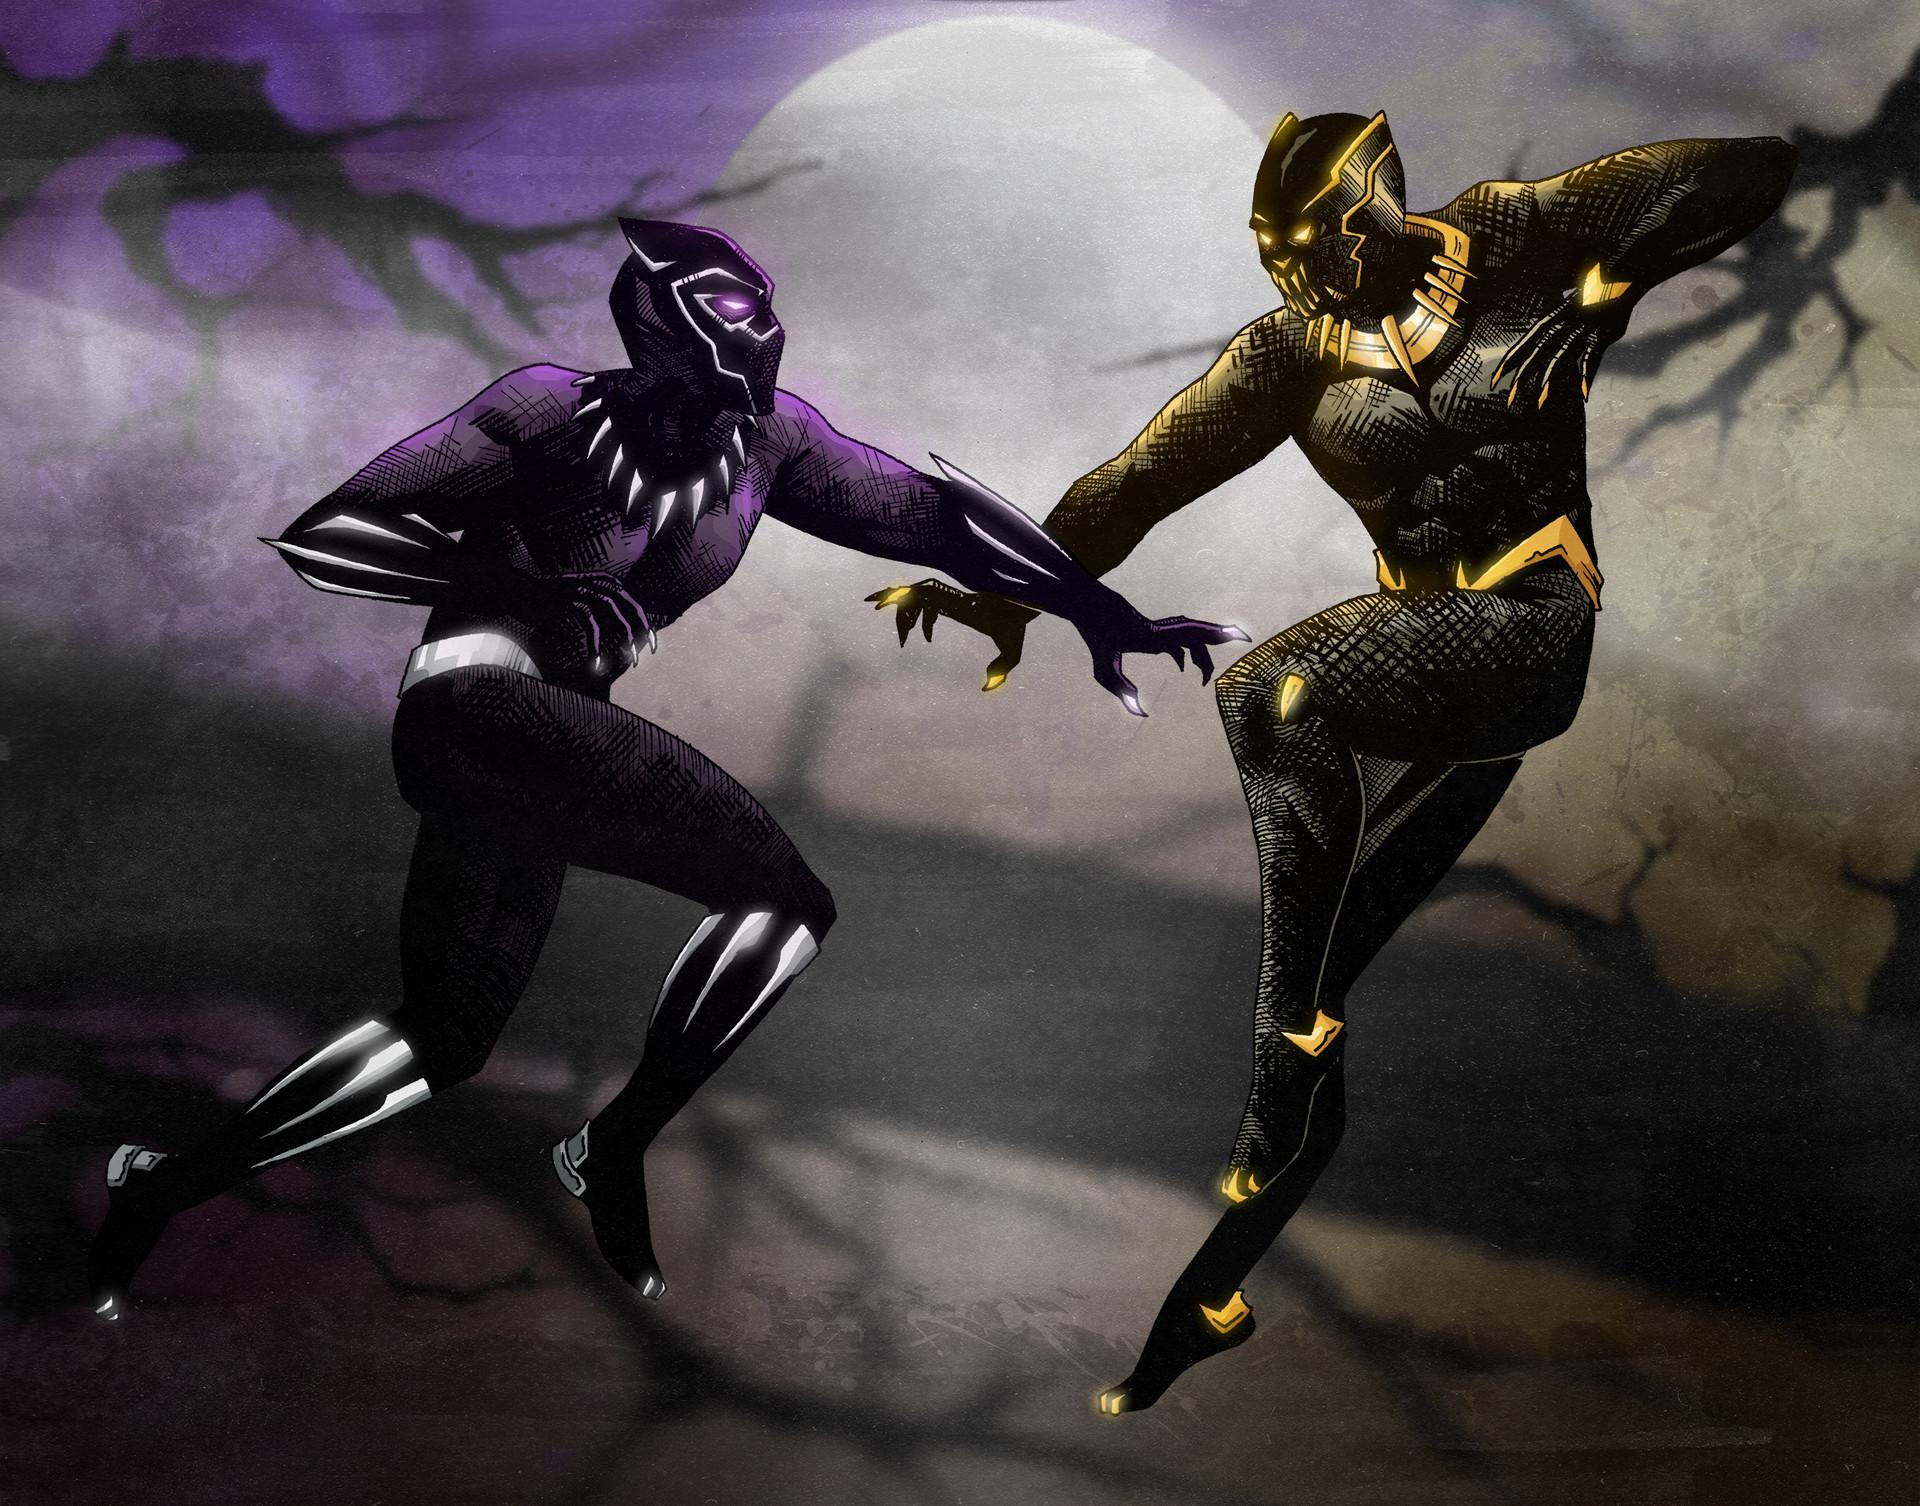 ArtStation - Black panther vs Killmonger, Nikolas Alecsovich - photo#3